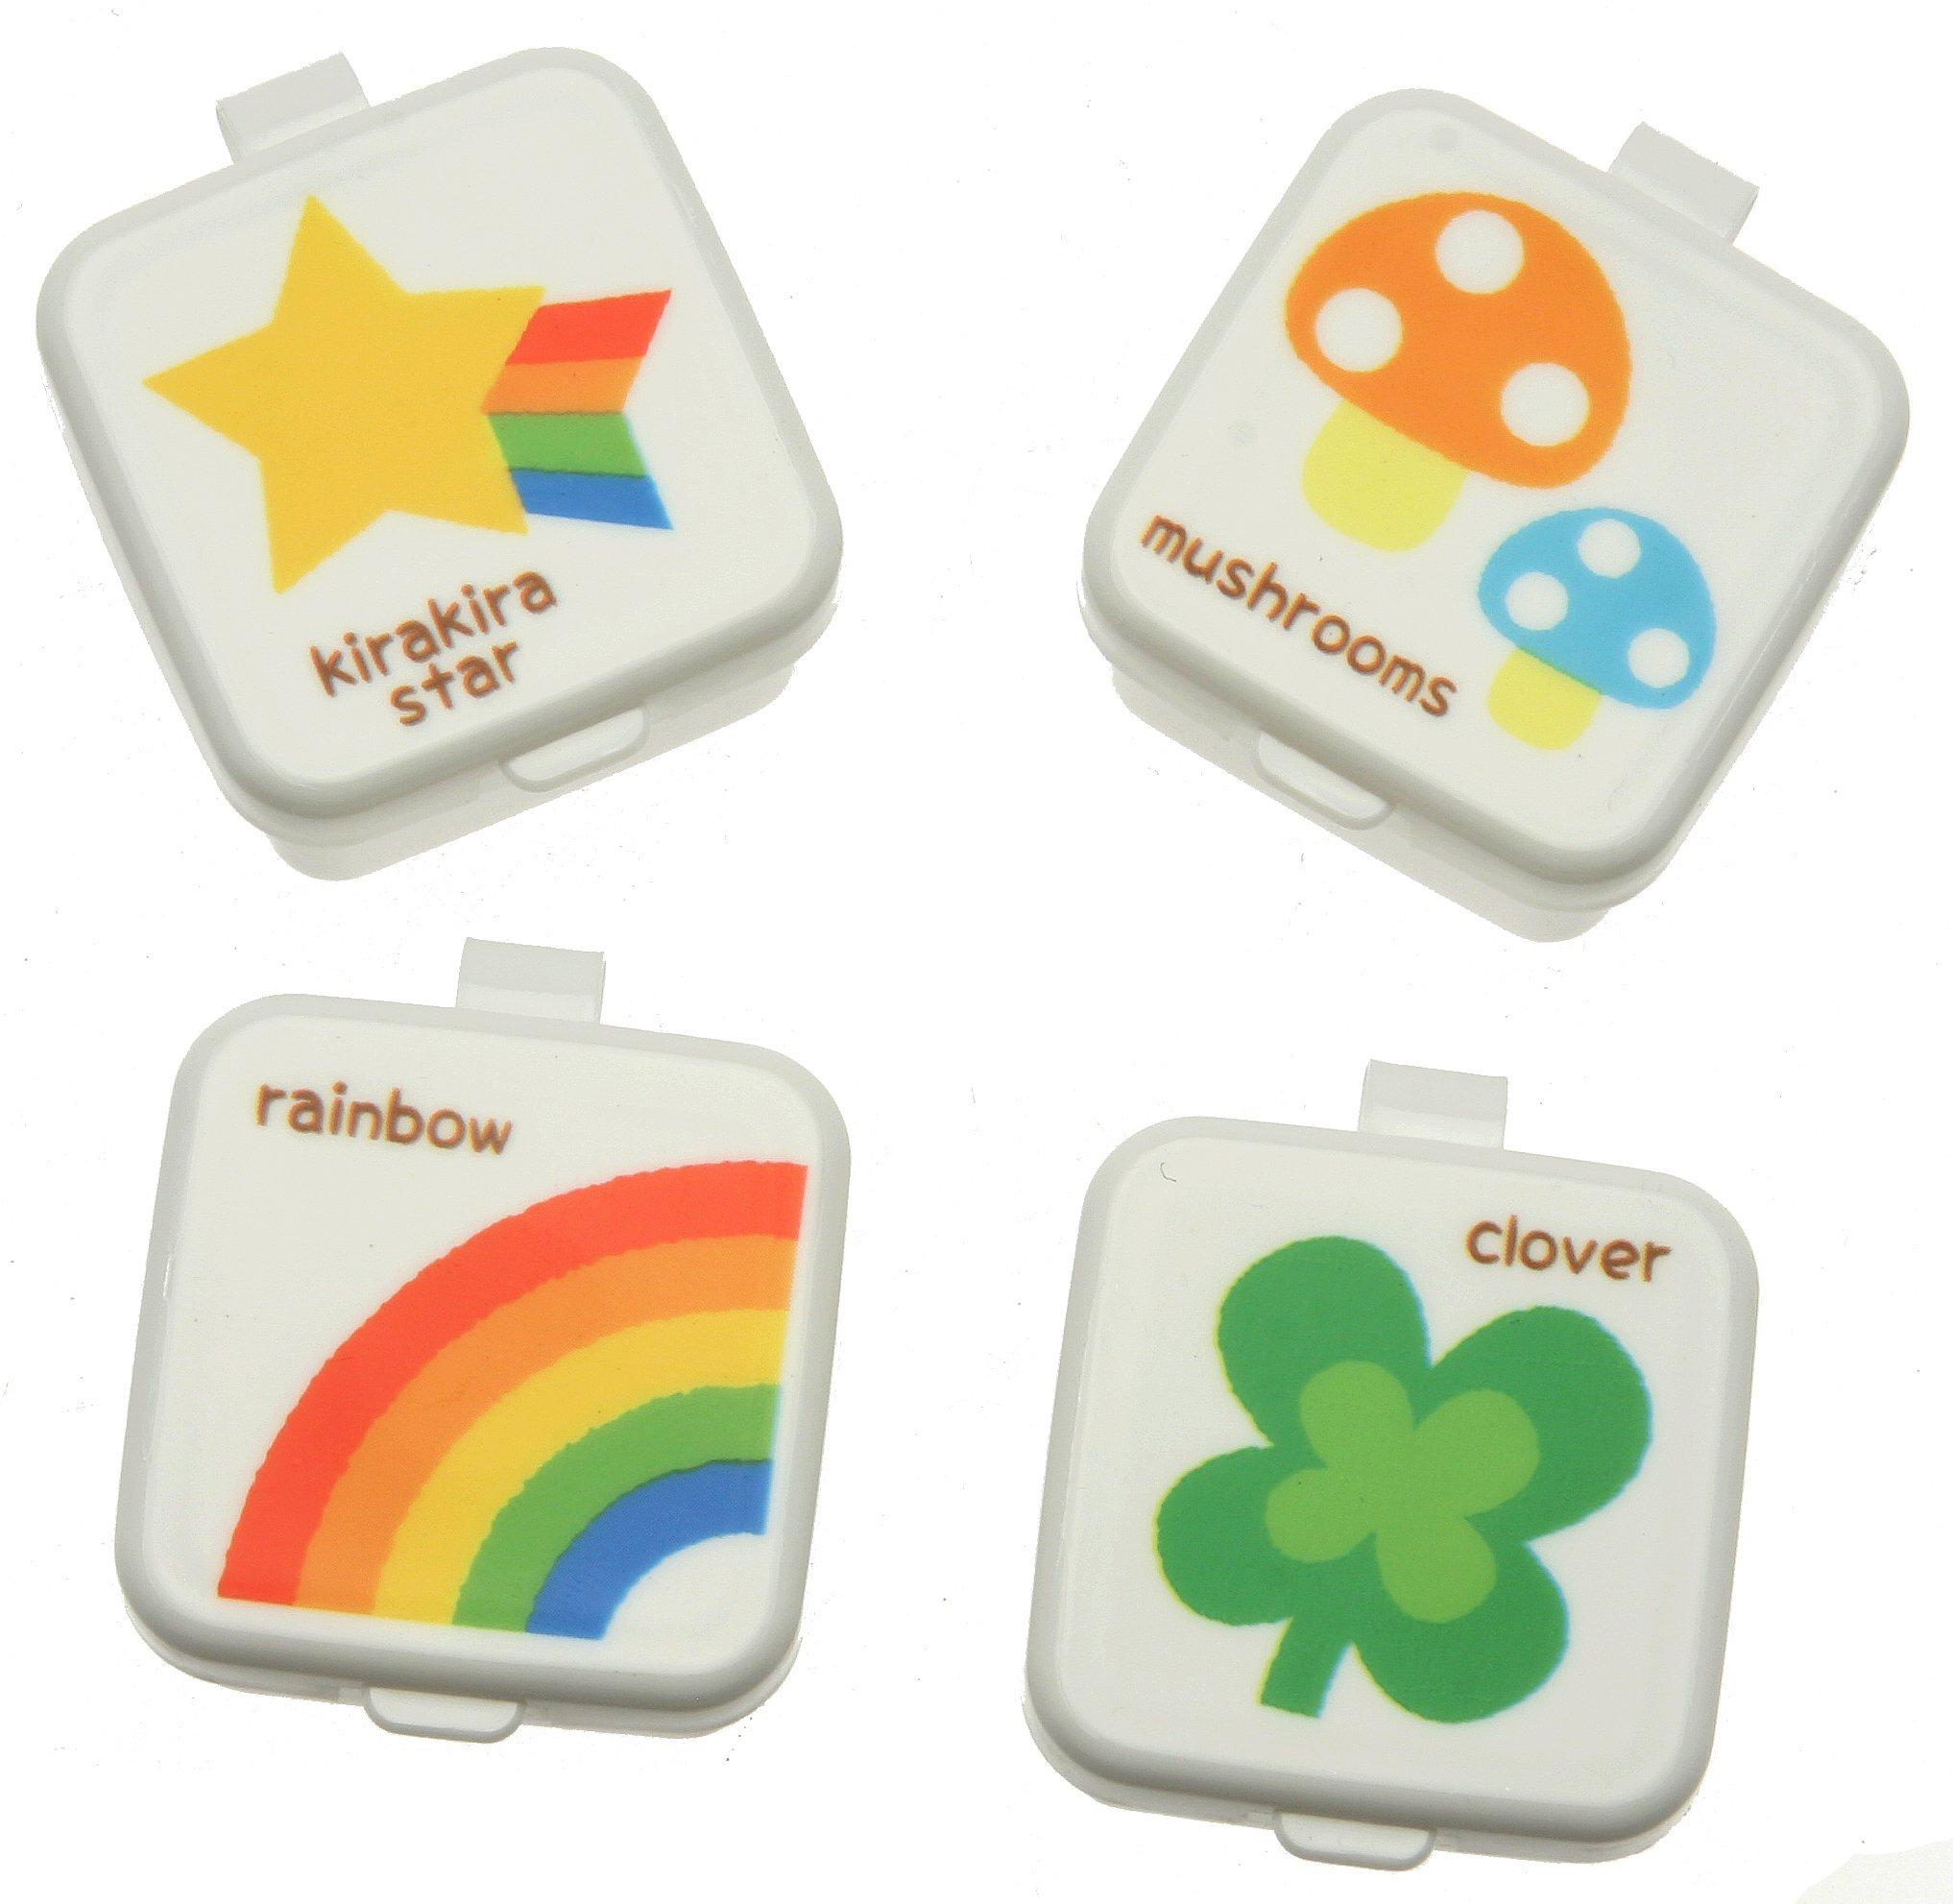 Kotobuki Condiment Containers for Bento Box, Mini, Rainbow and Clover